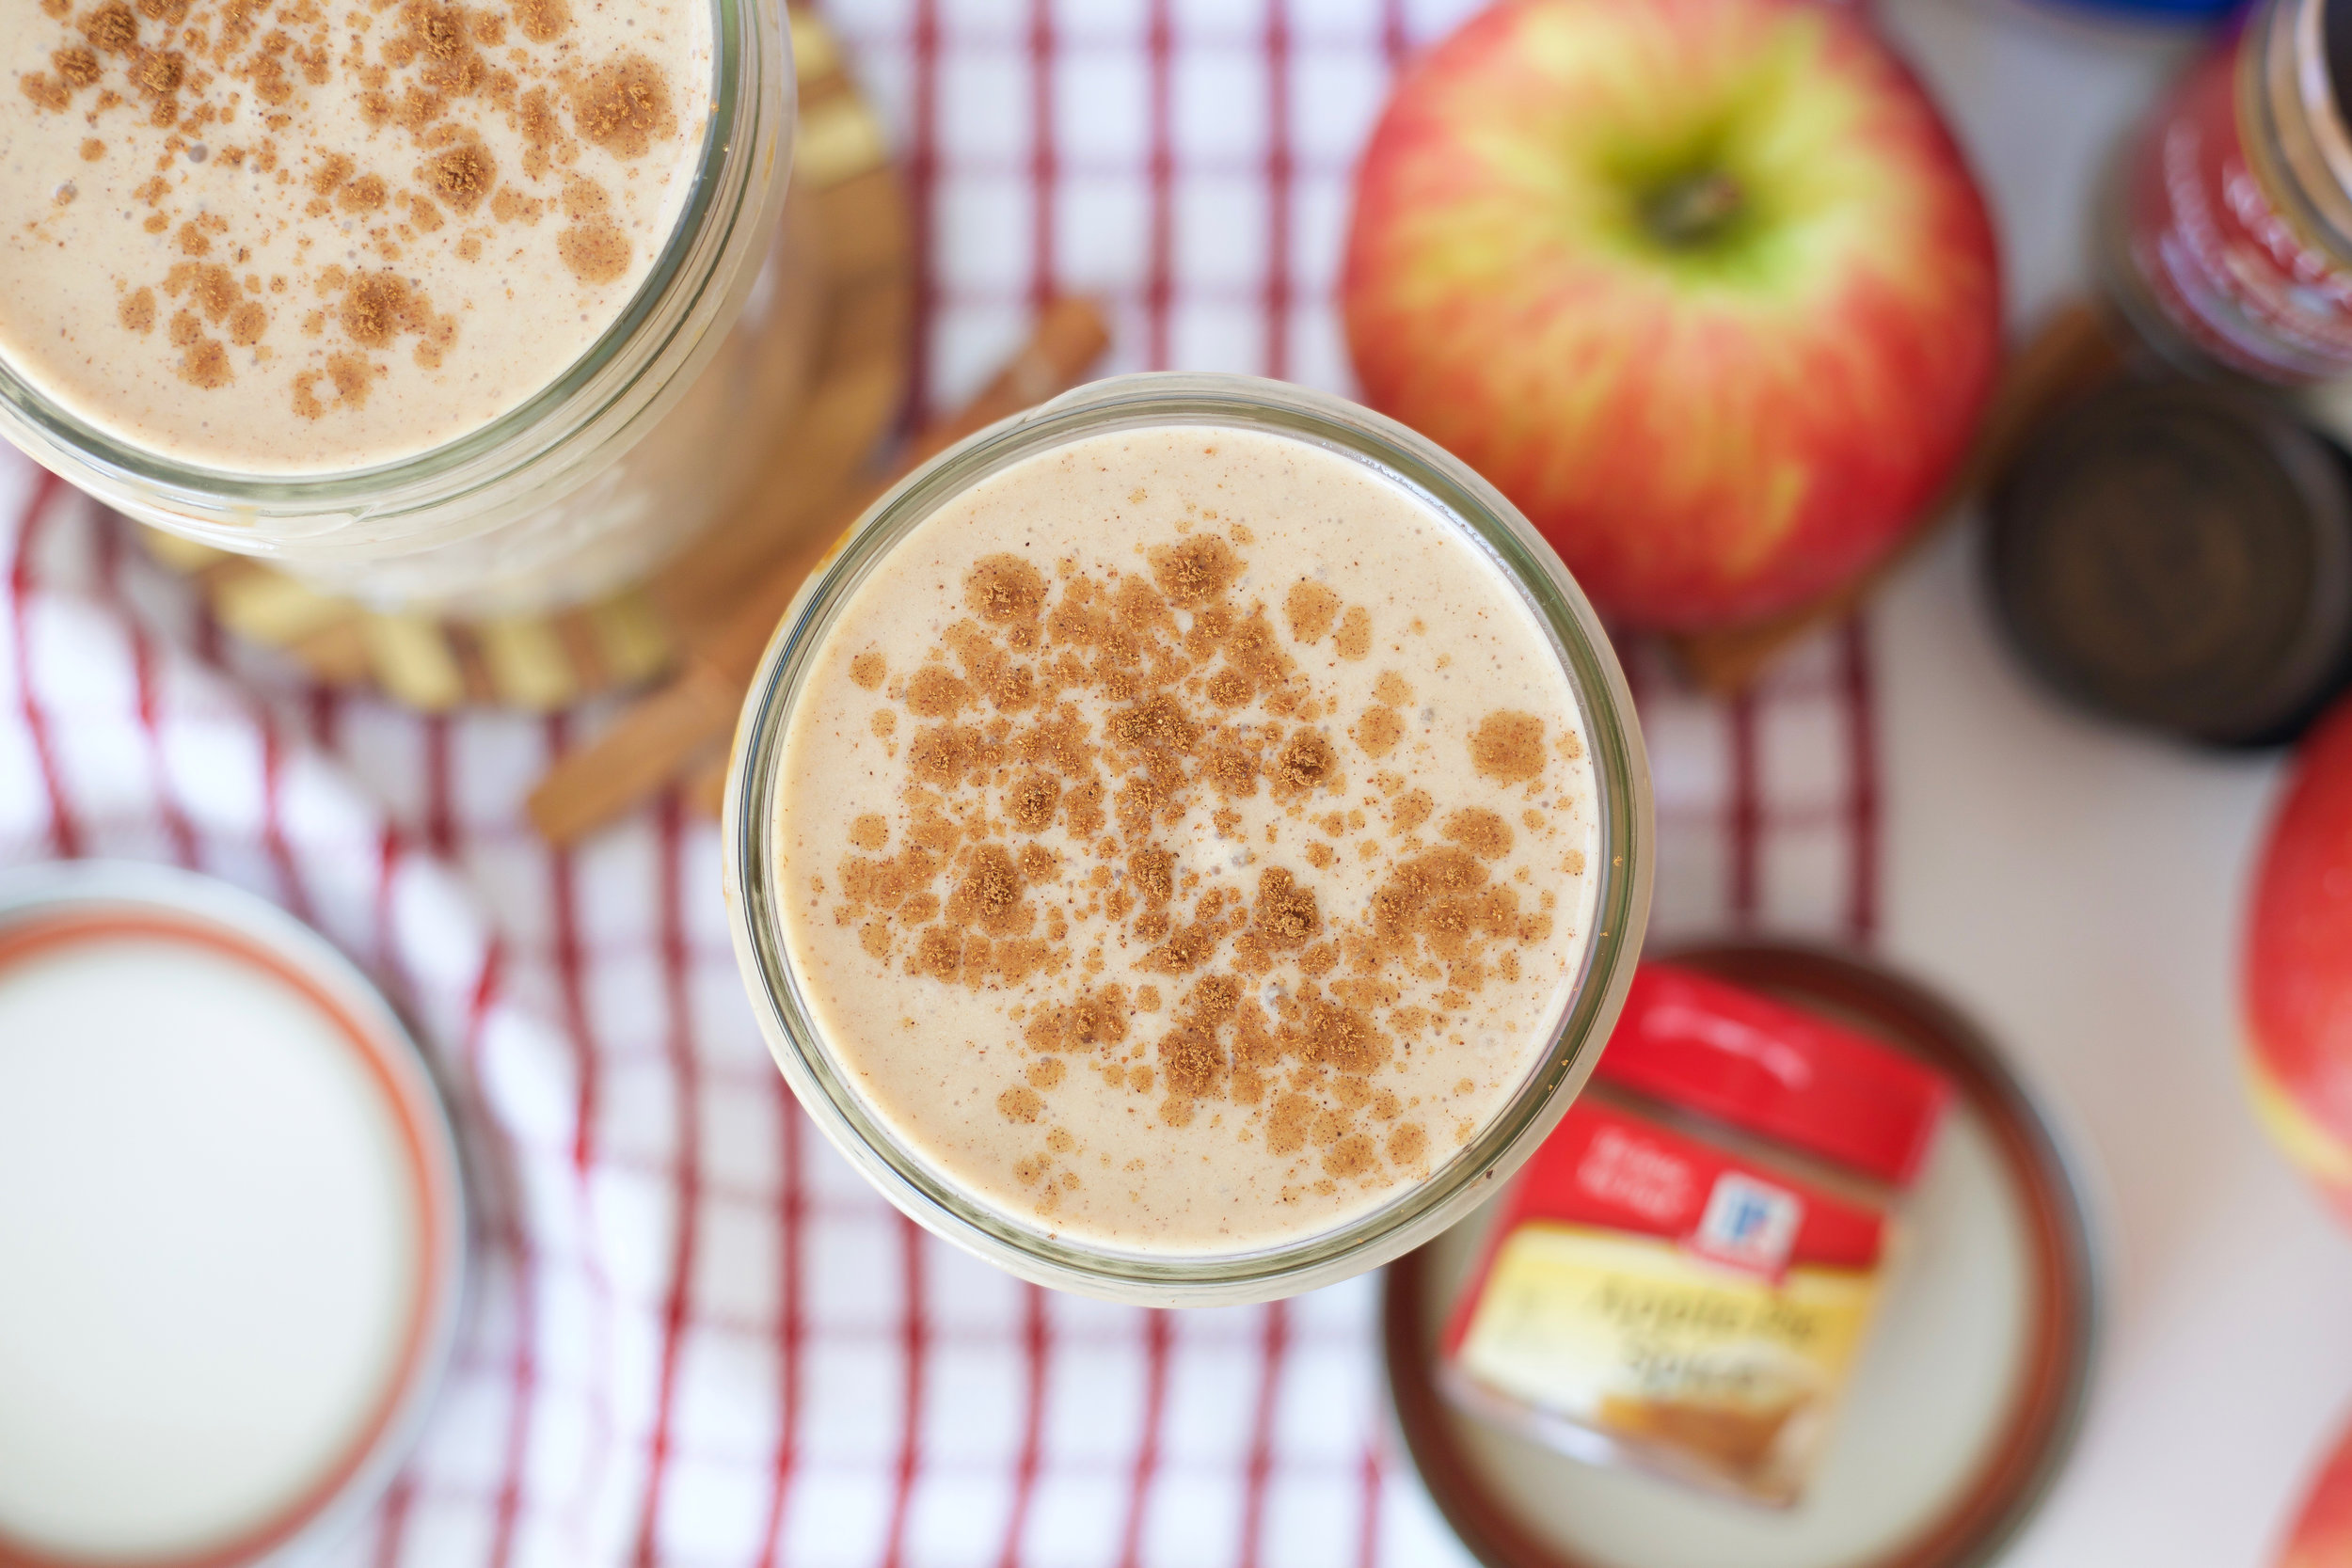 Apple pie smoothie, Paleo, Gluten Free, Grain Free, Dairy Free, Post Workout, Protein Smoothie, Almond Milk, Primal